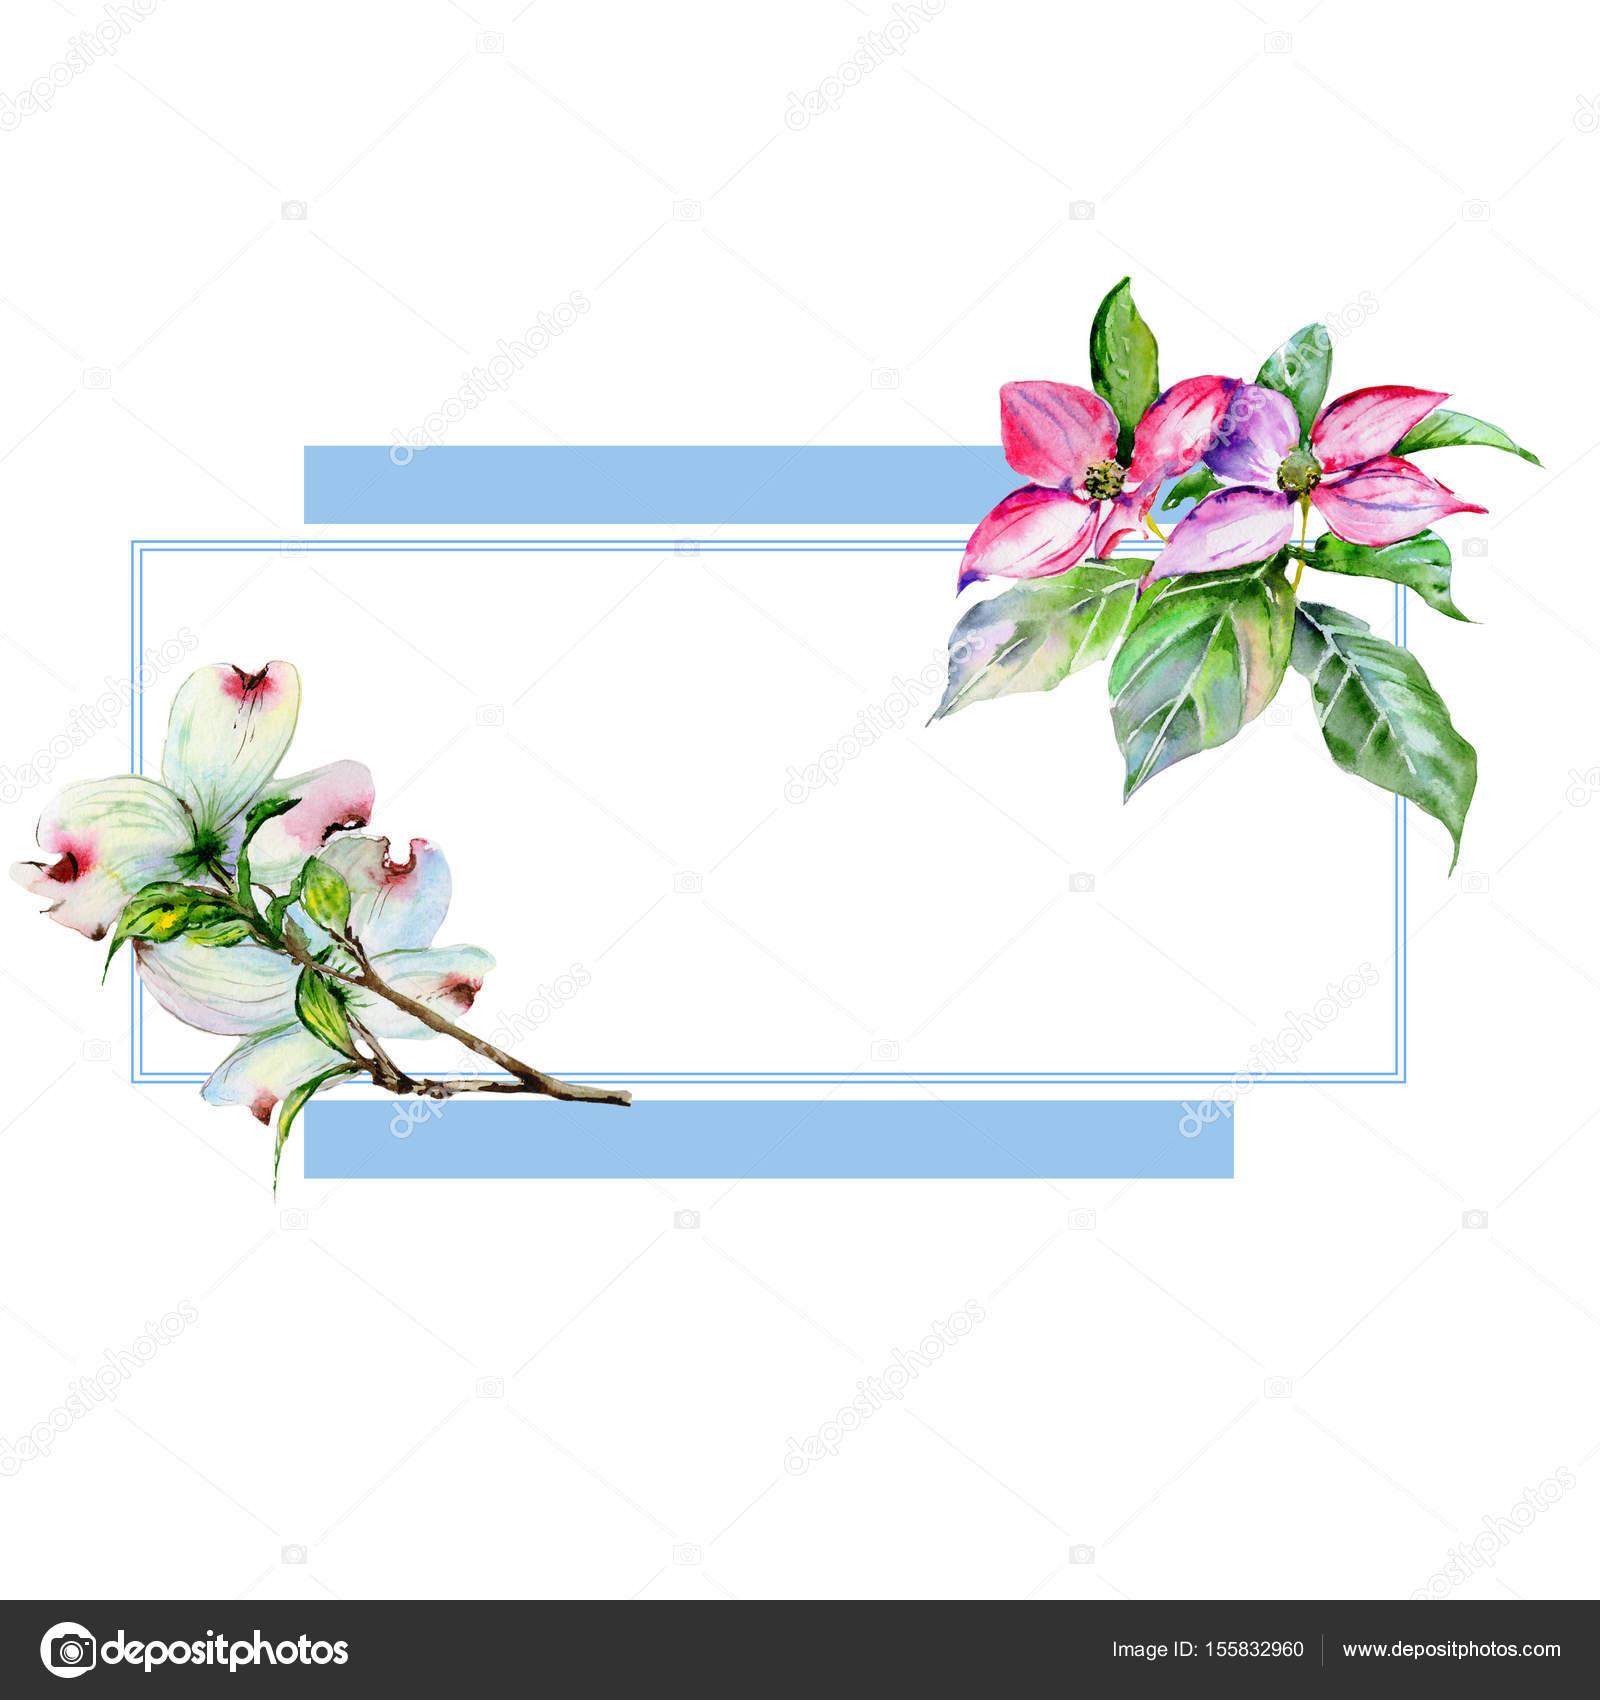 Wildflower dogwood flower frame in a watercolor style isolated wildflower dogwood flower frame in a watercolor style isolated stock photo izmirmasajfo